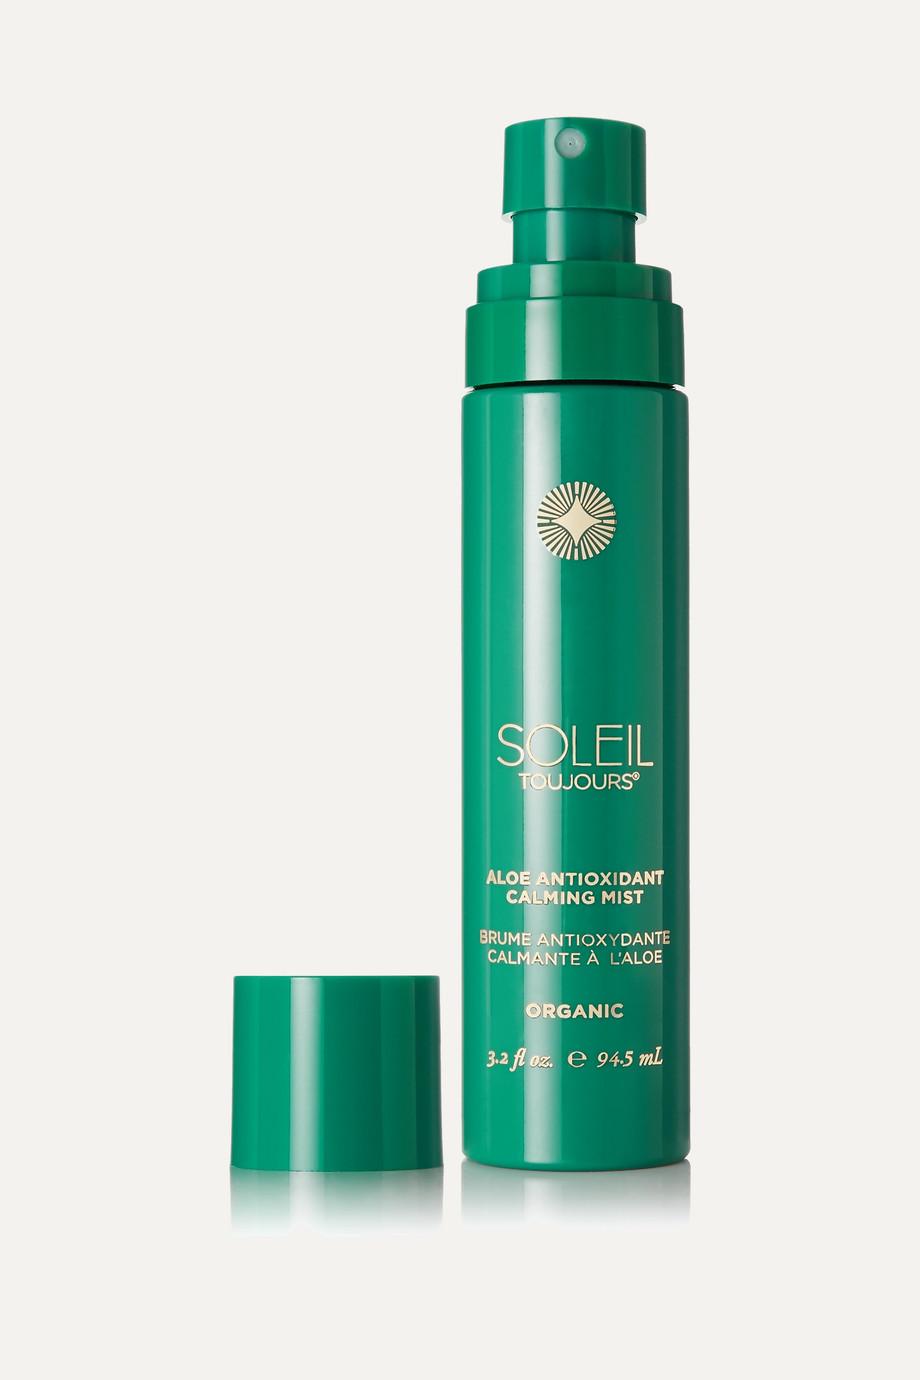 Soleil Toujours + NET SUSTAIN Organic Aloe Antioxidant Calming Mist, 94.5ml